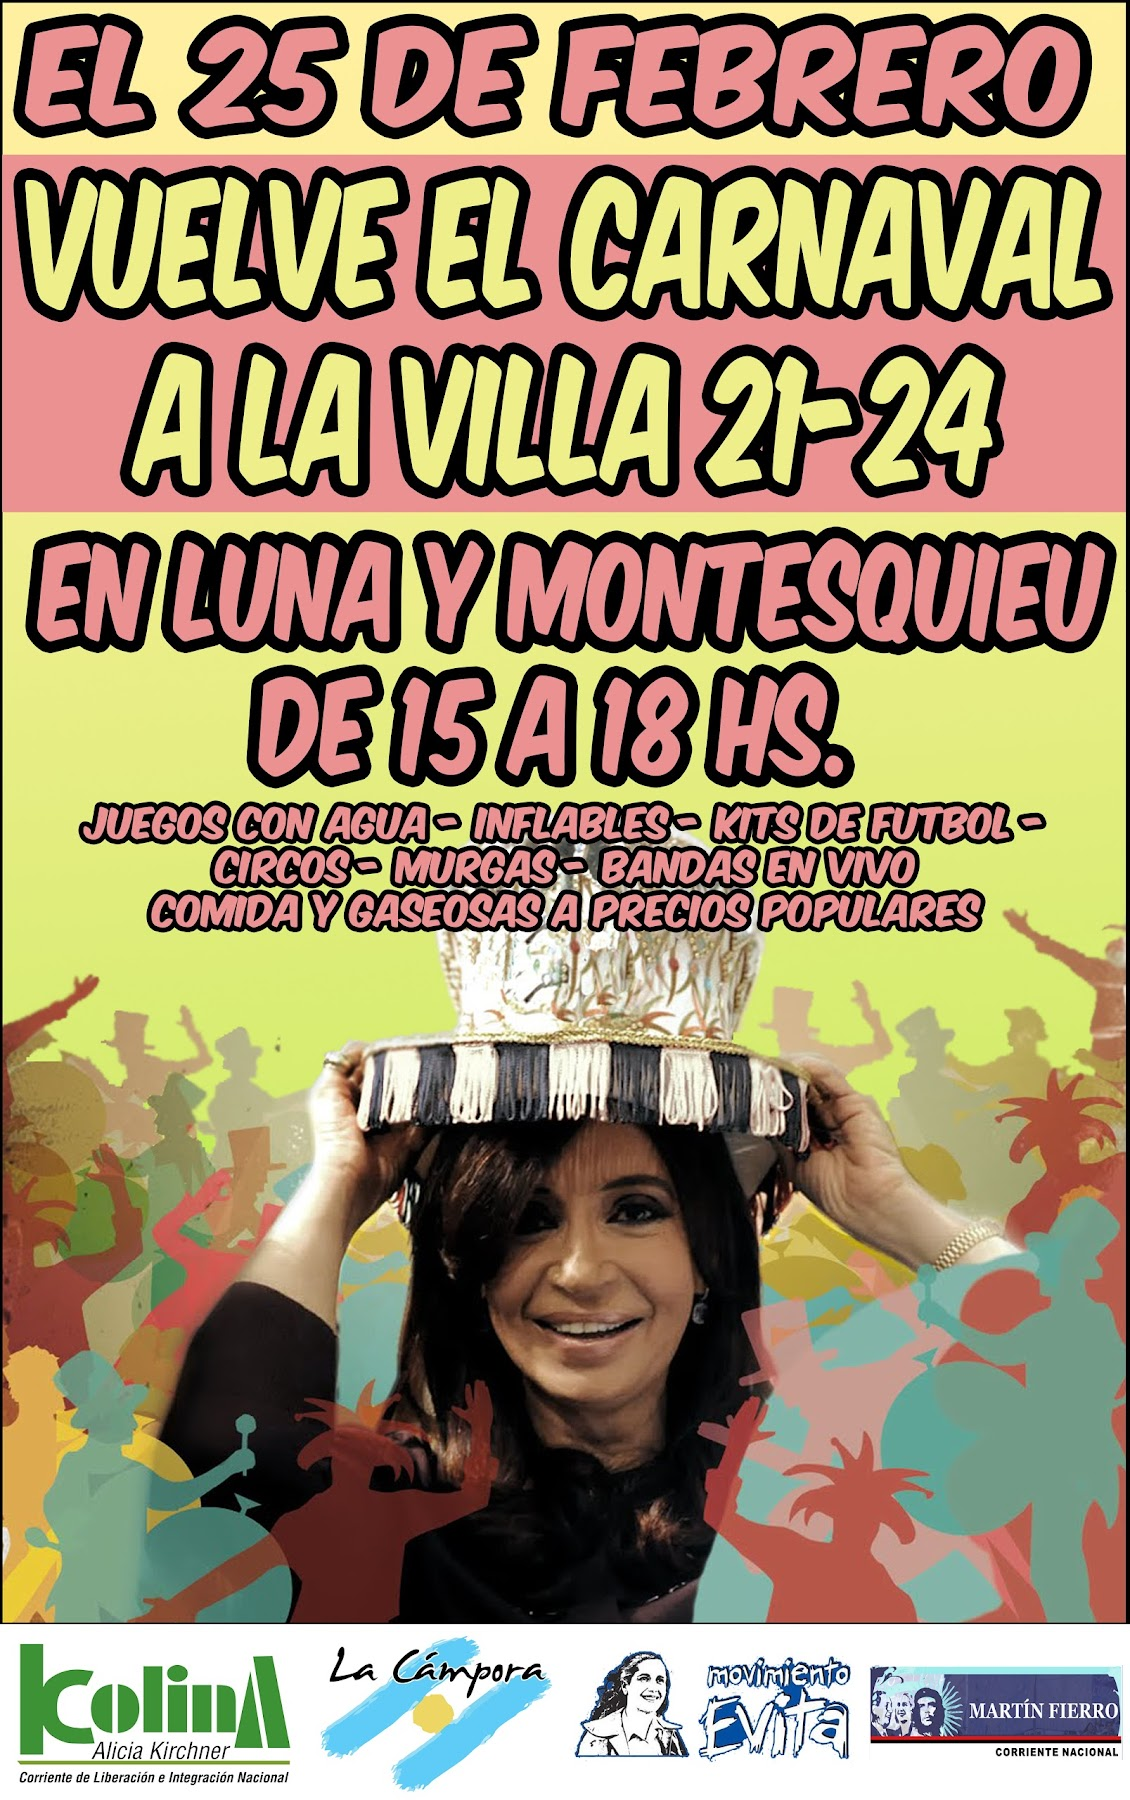 http://3.bp.blogspot.com/-s16liZXSMjU/Tz2jsgkiJkI/AAAAAAAAApM/Dm9Id0Hp_jw/s1800/carnaval.jpg